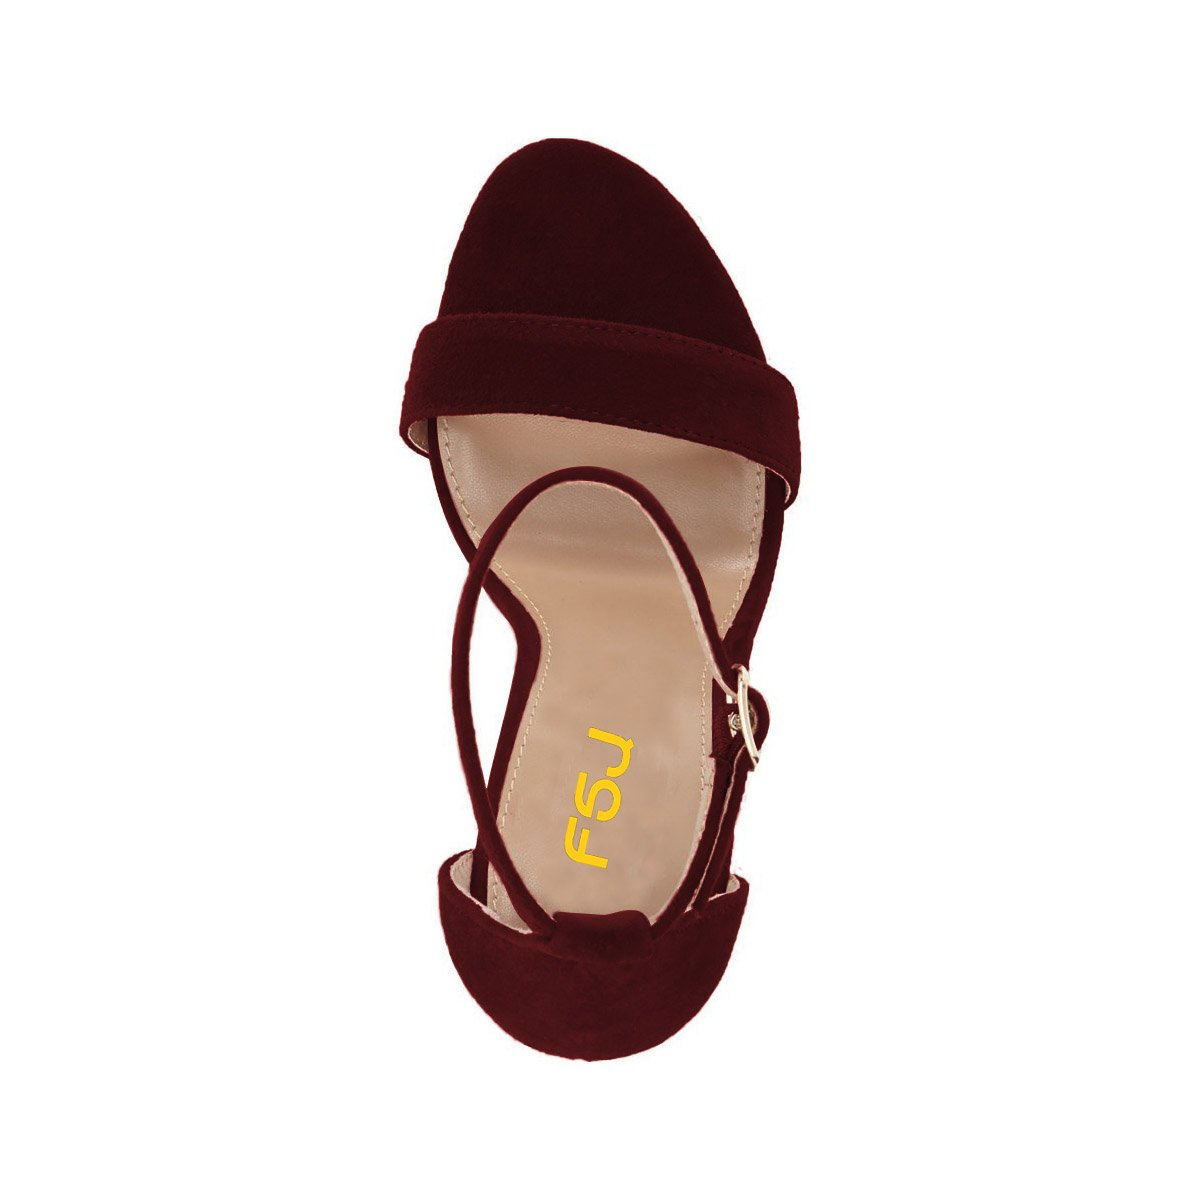 0c2972f3c71 FSJ Women Classic Chunky High Heel Sandals Open Toe Ankle Strap Single Band  Dress Shoes Size 4-15 US